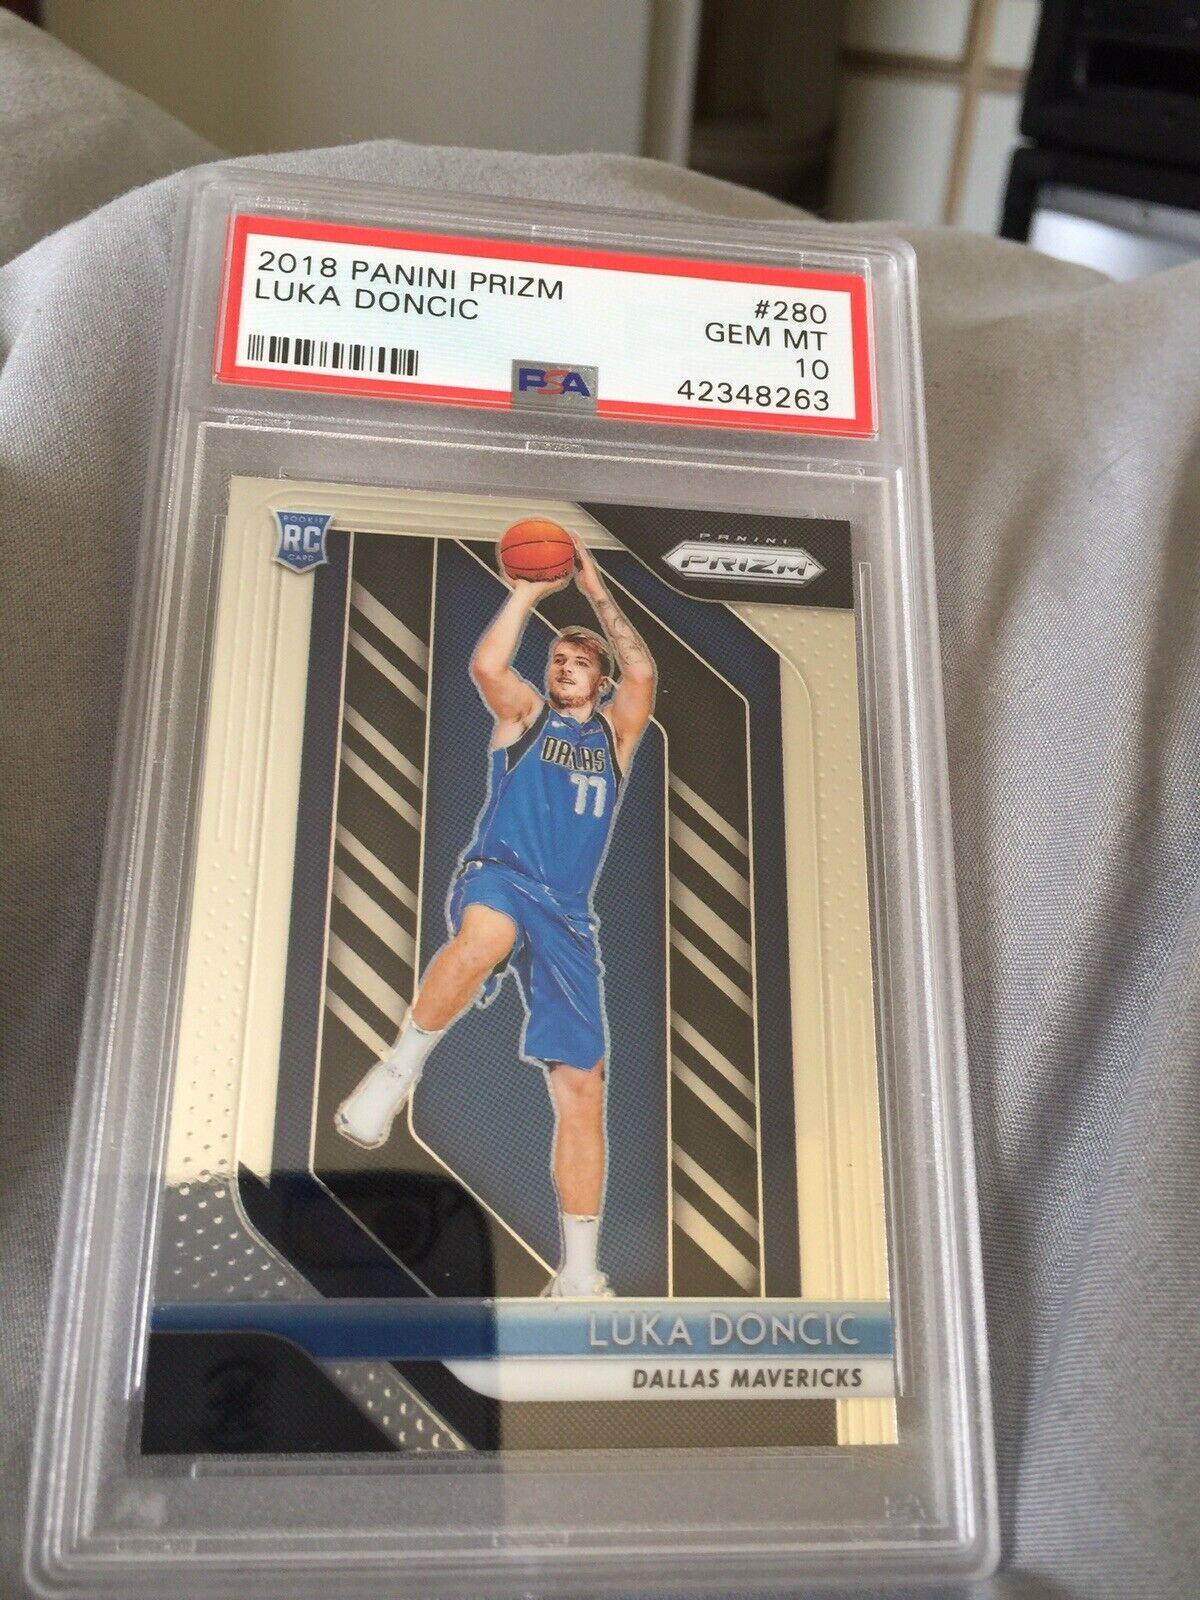 Repack 2018-19 Luka Doncic Prizm PSA 10 NBA Basketball Cards Hot